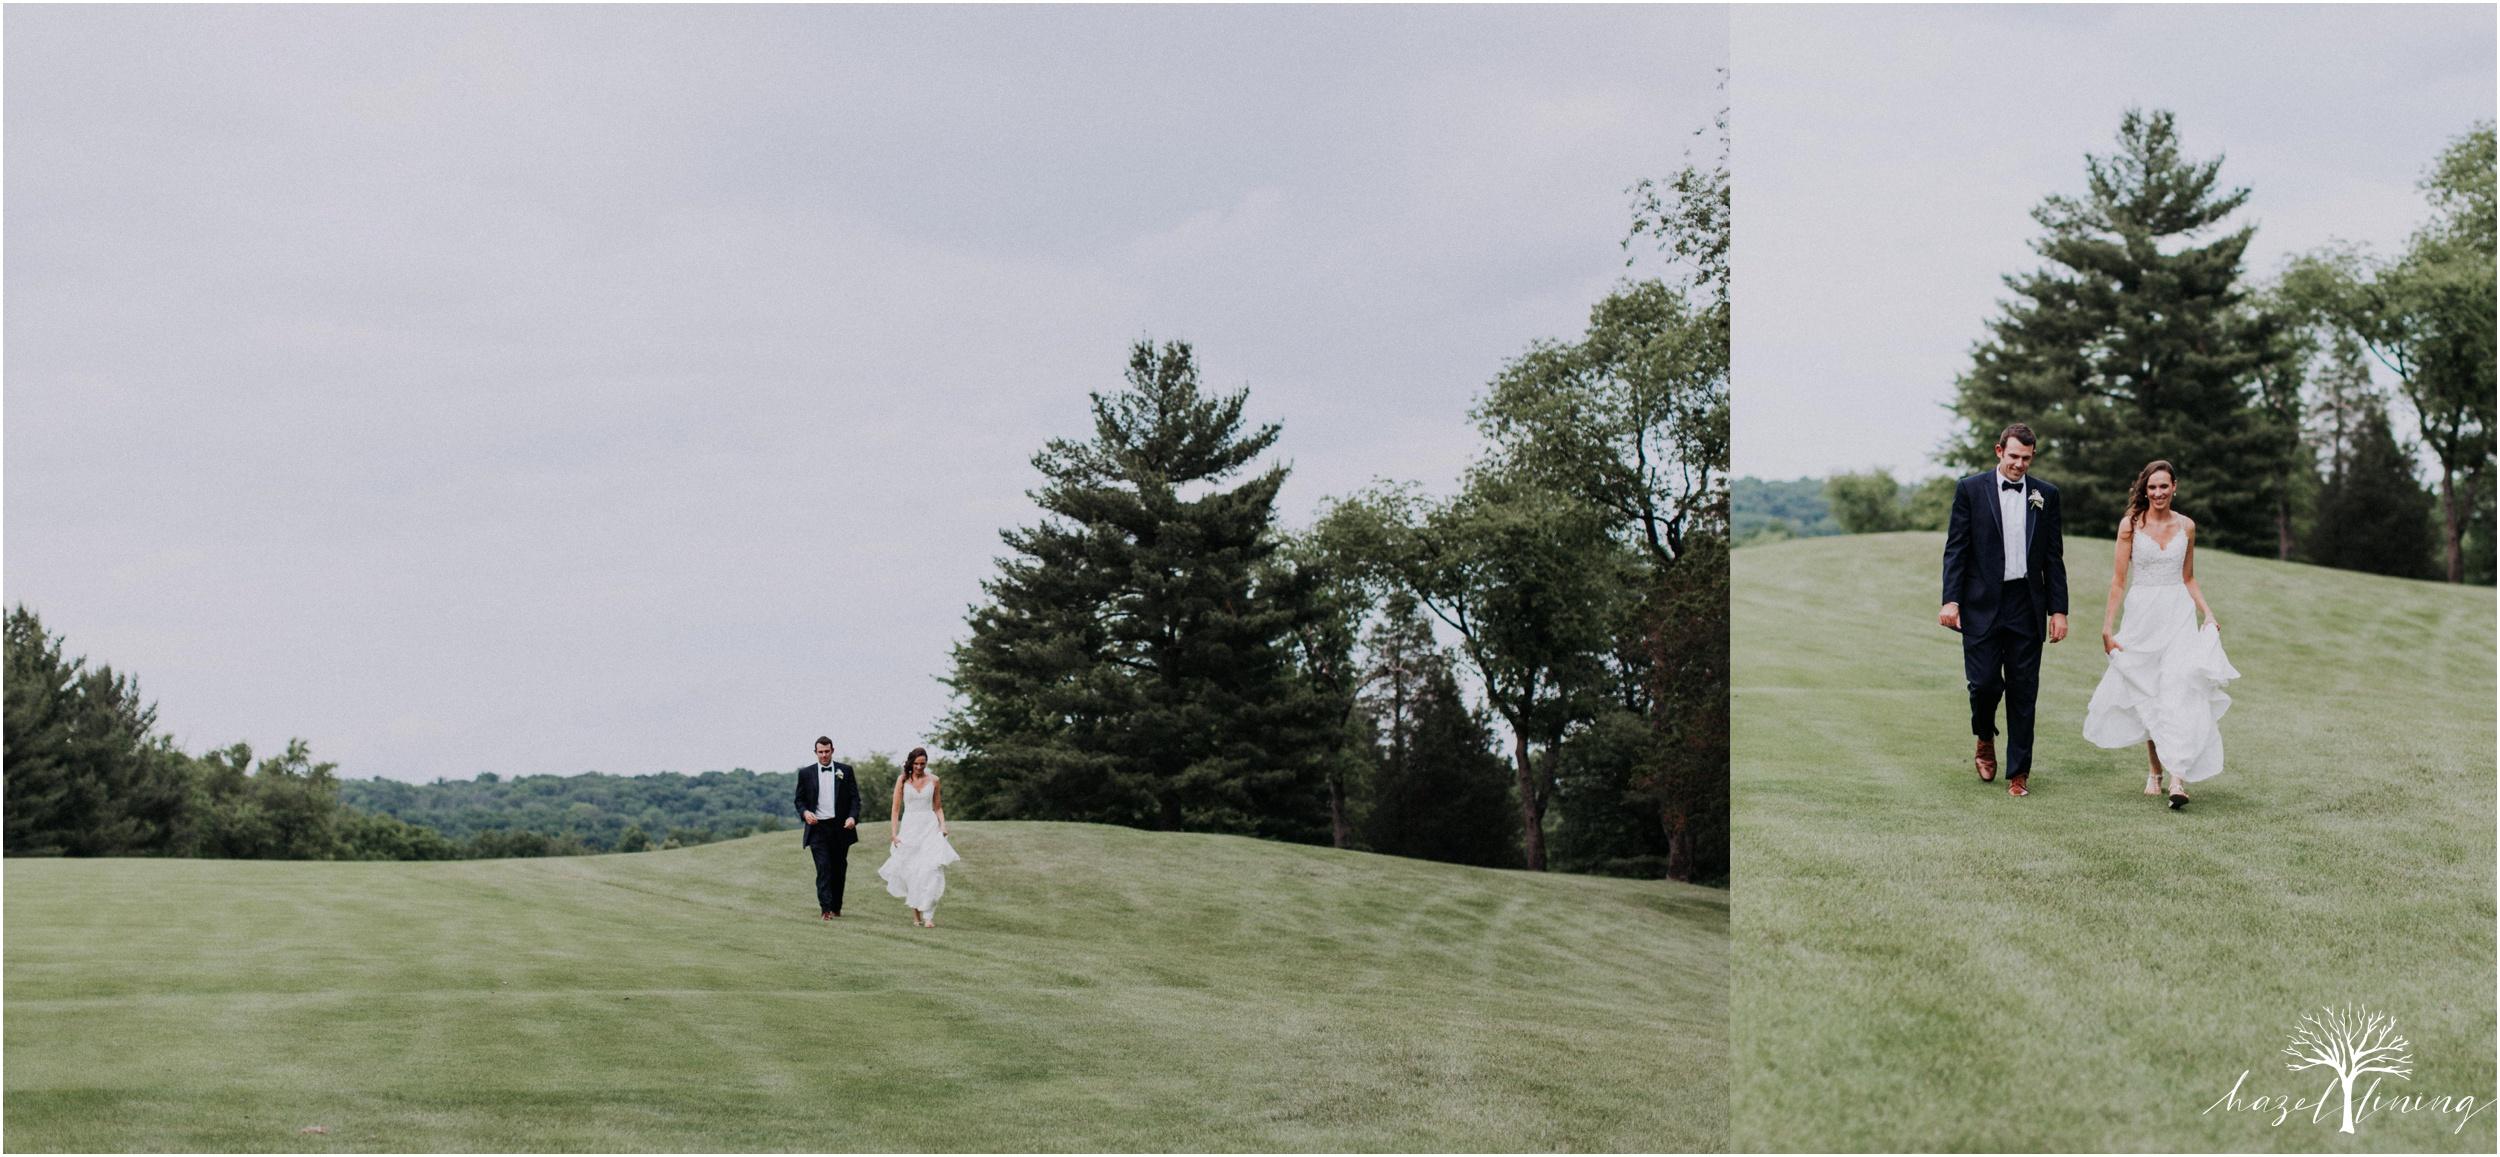 hazel-lining-travel-wedding-elopement-photography_0124.jpg